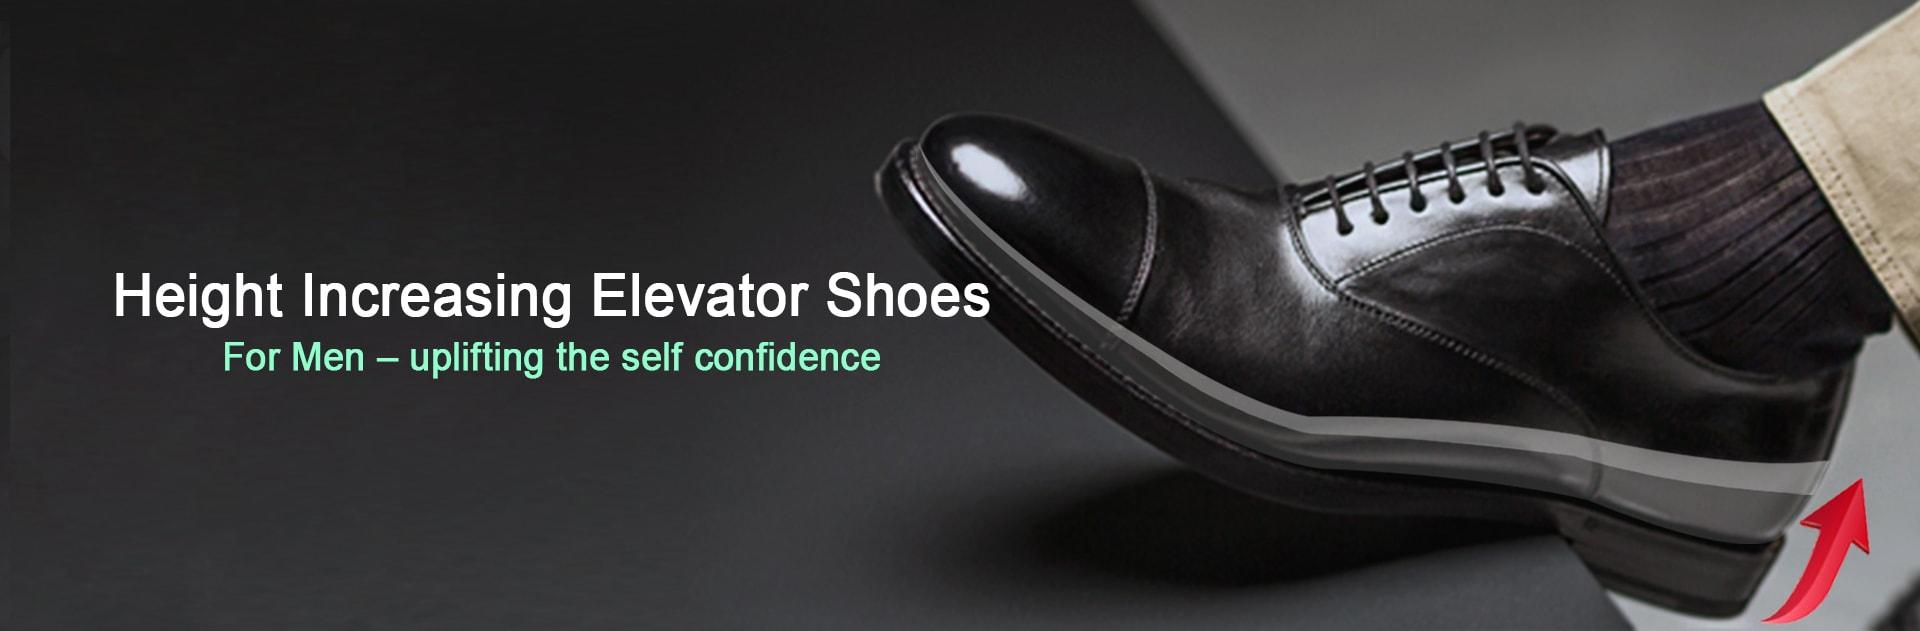 Height Increasing Elevator Shoes